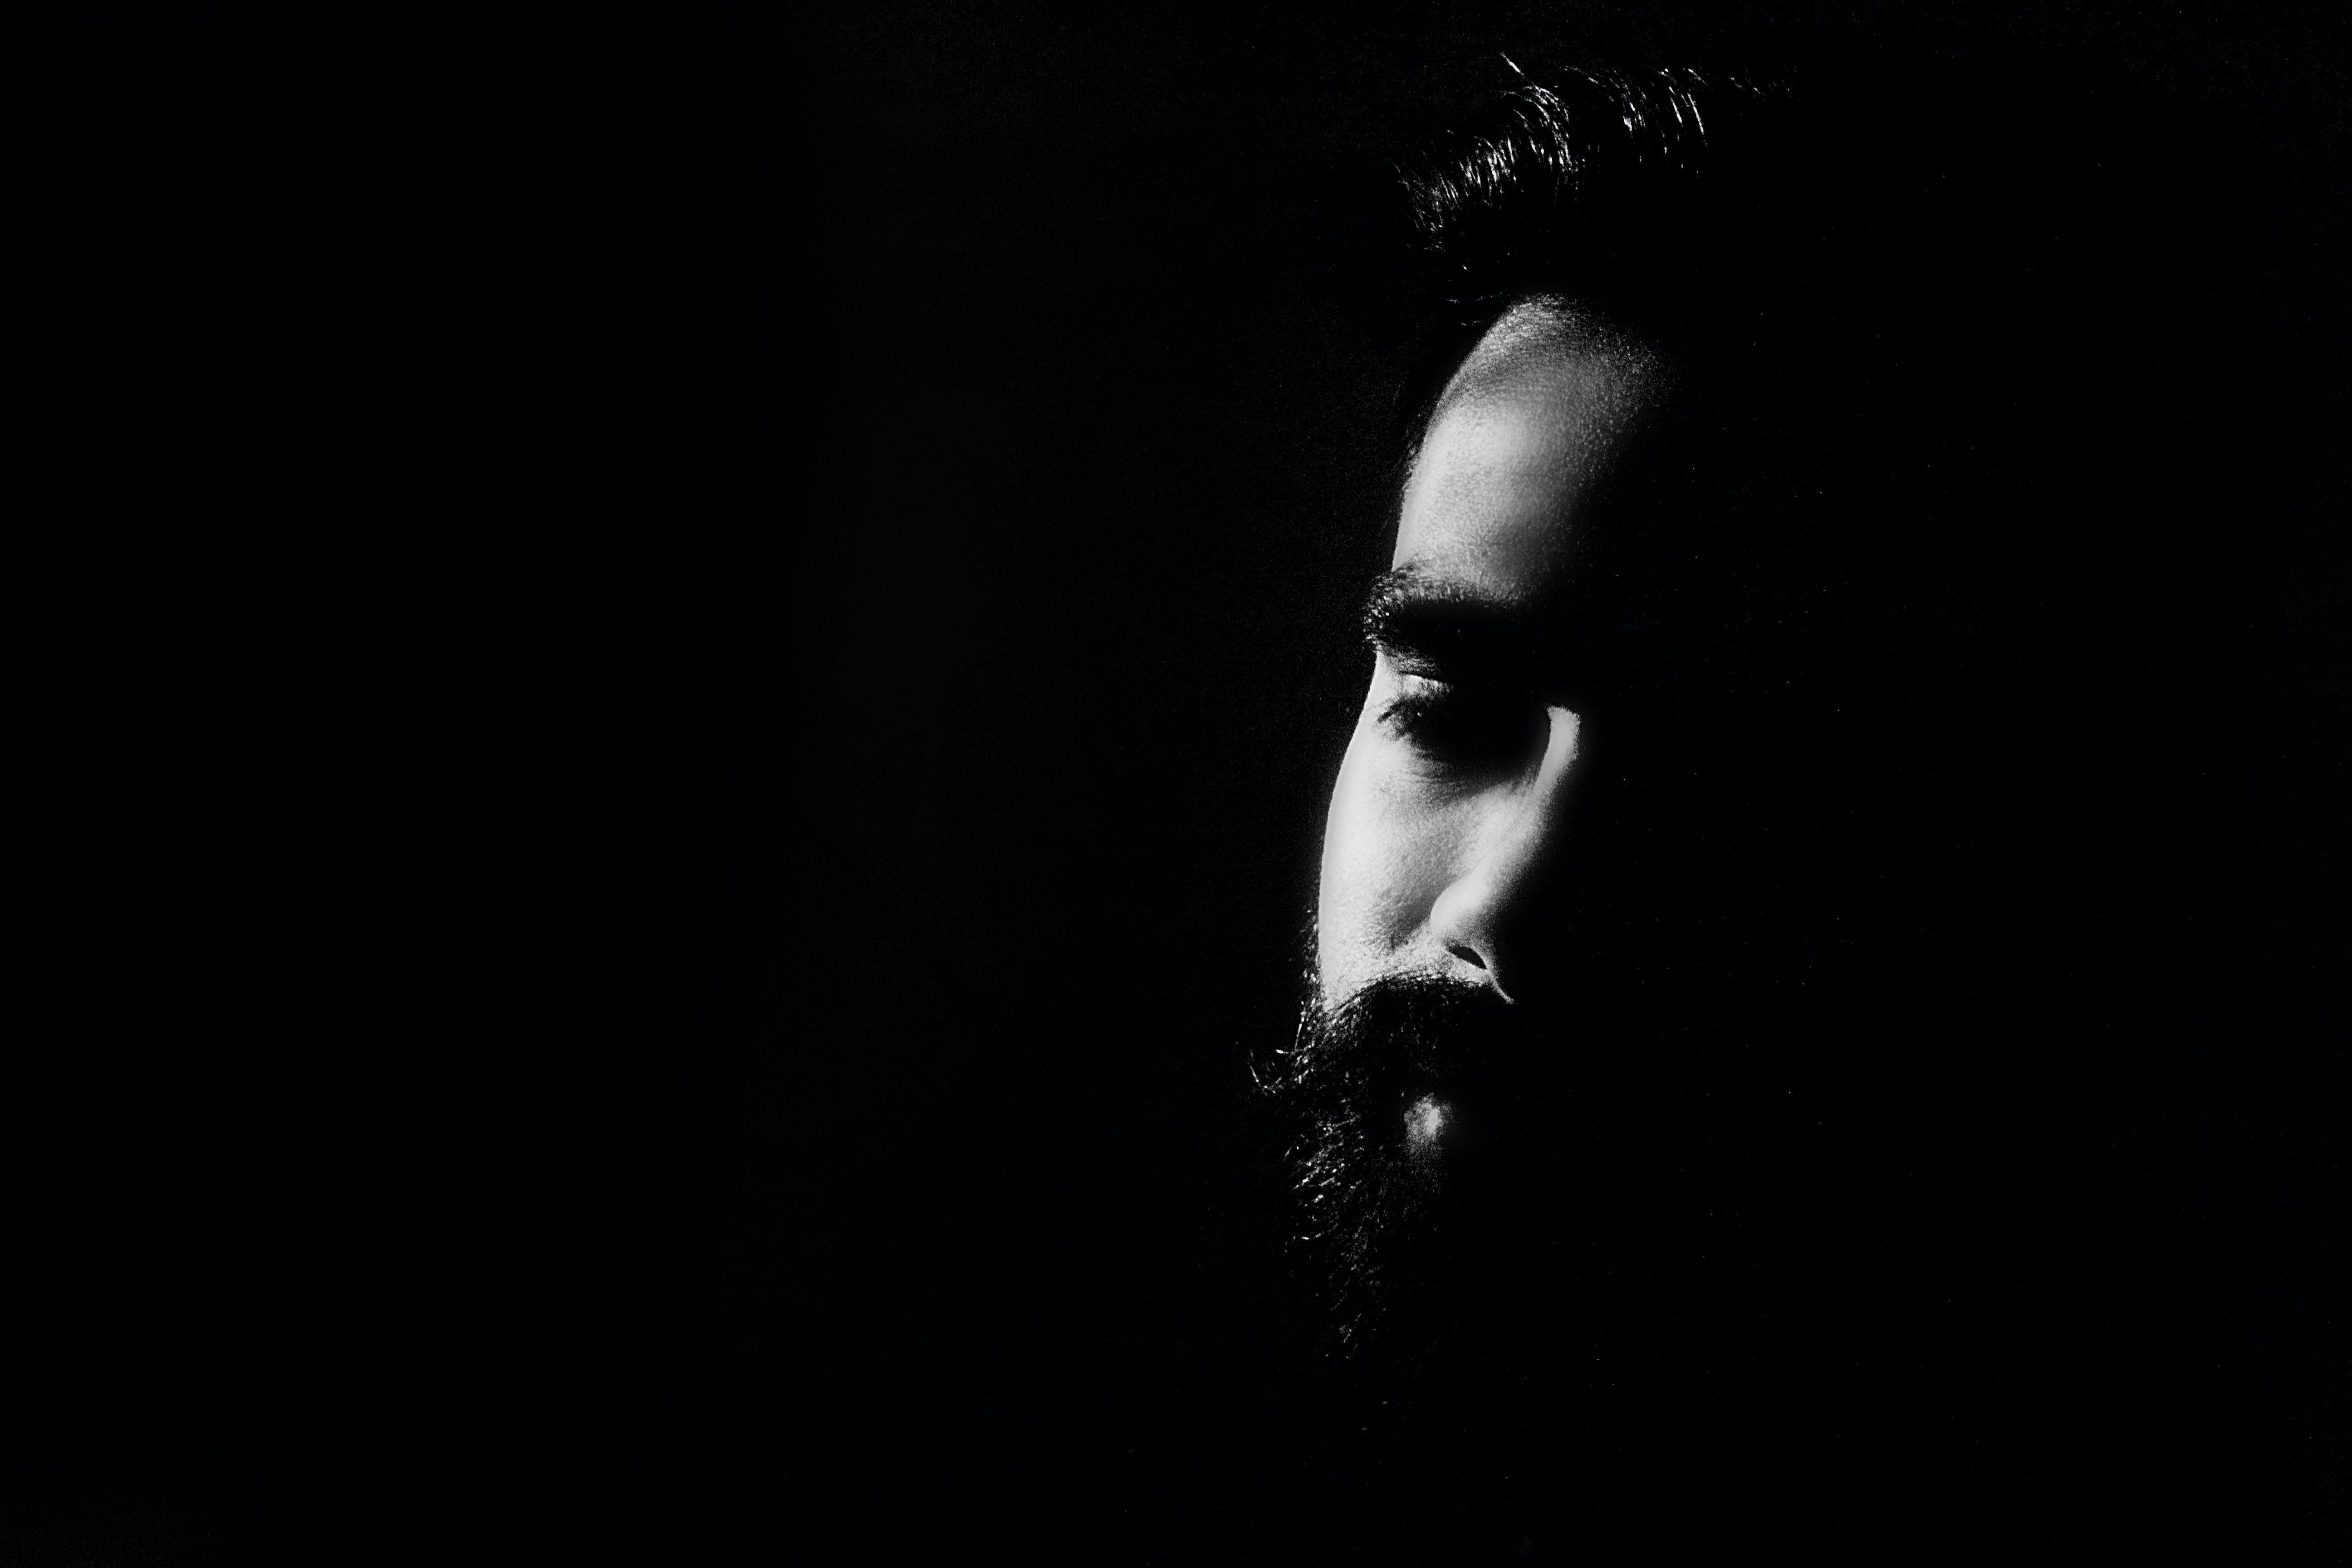 Man With Black Beard